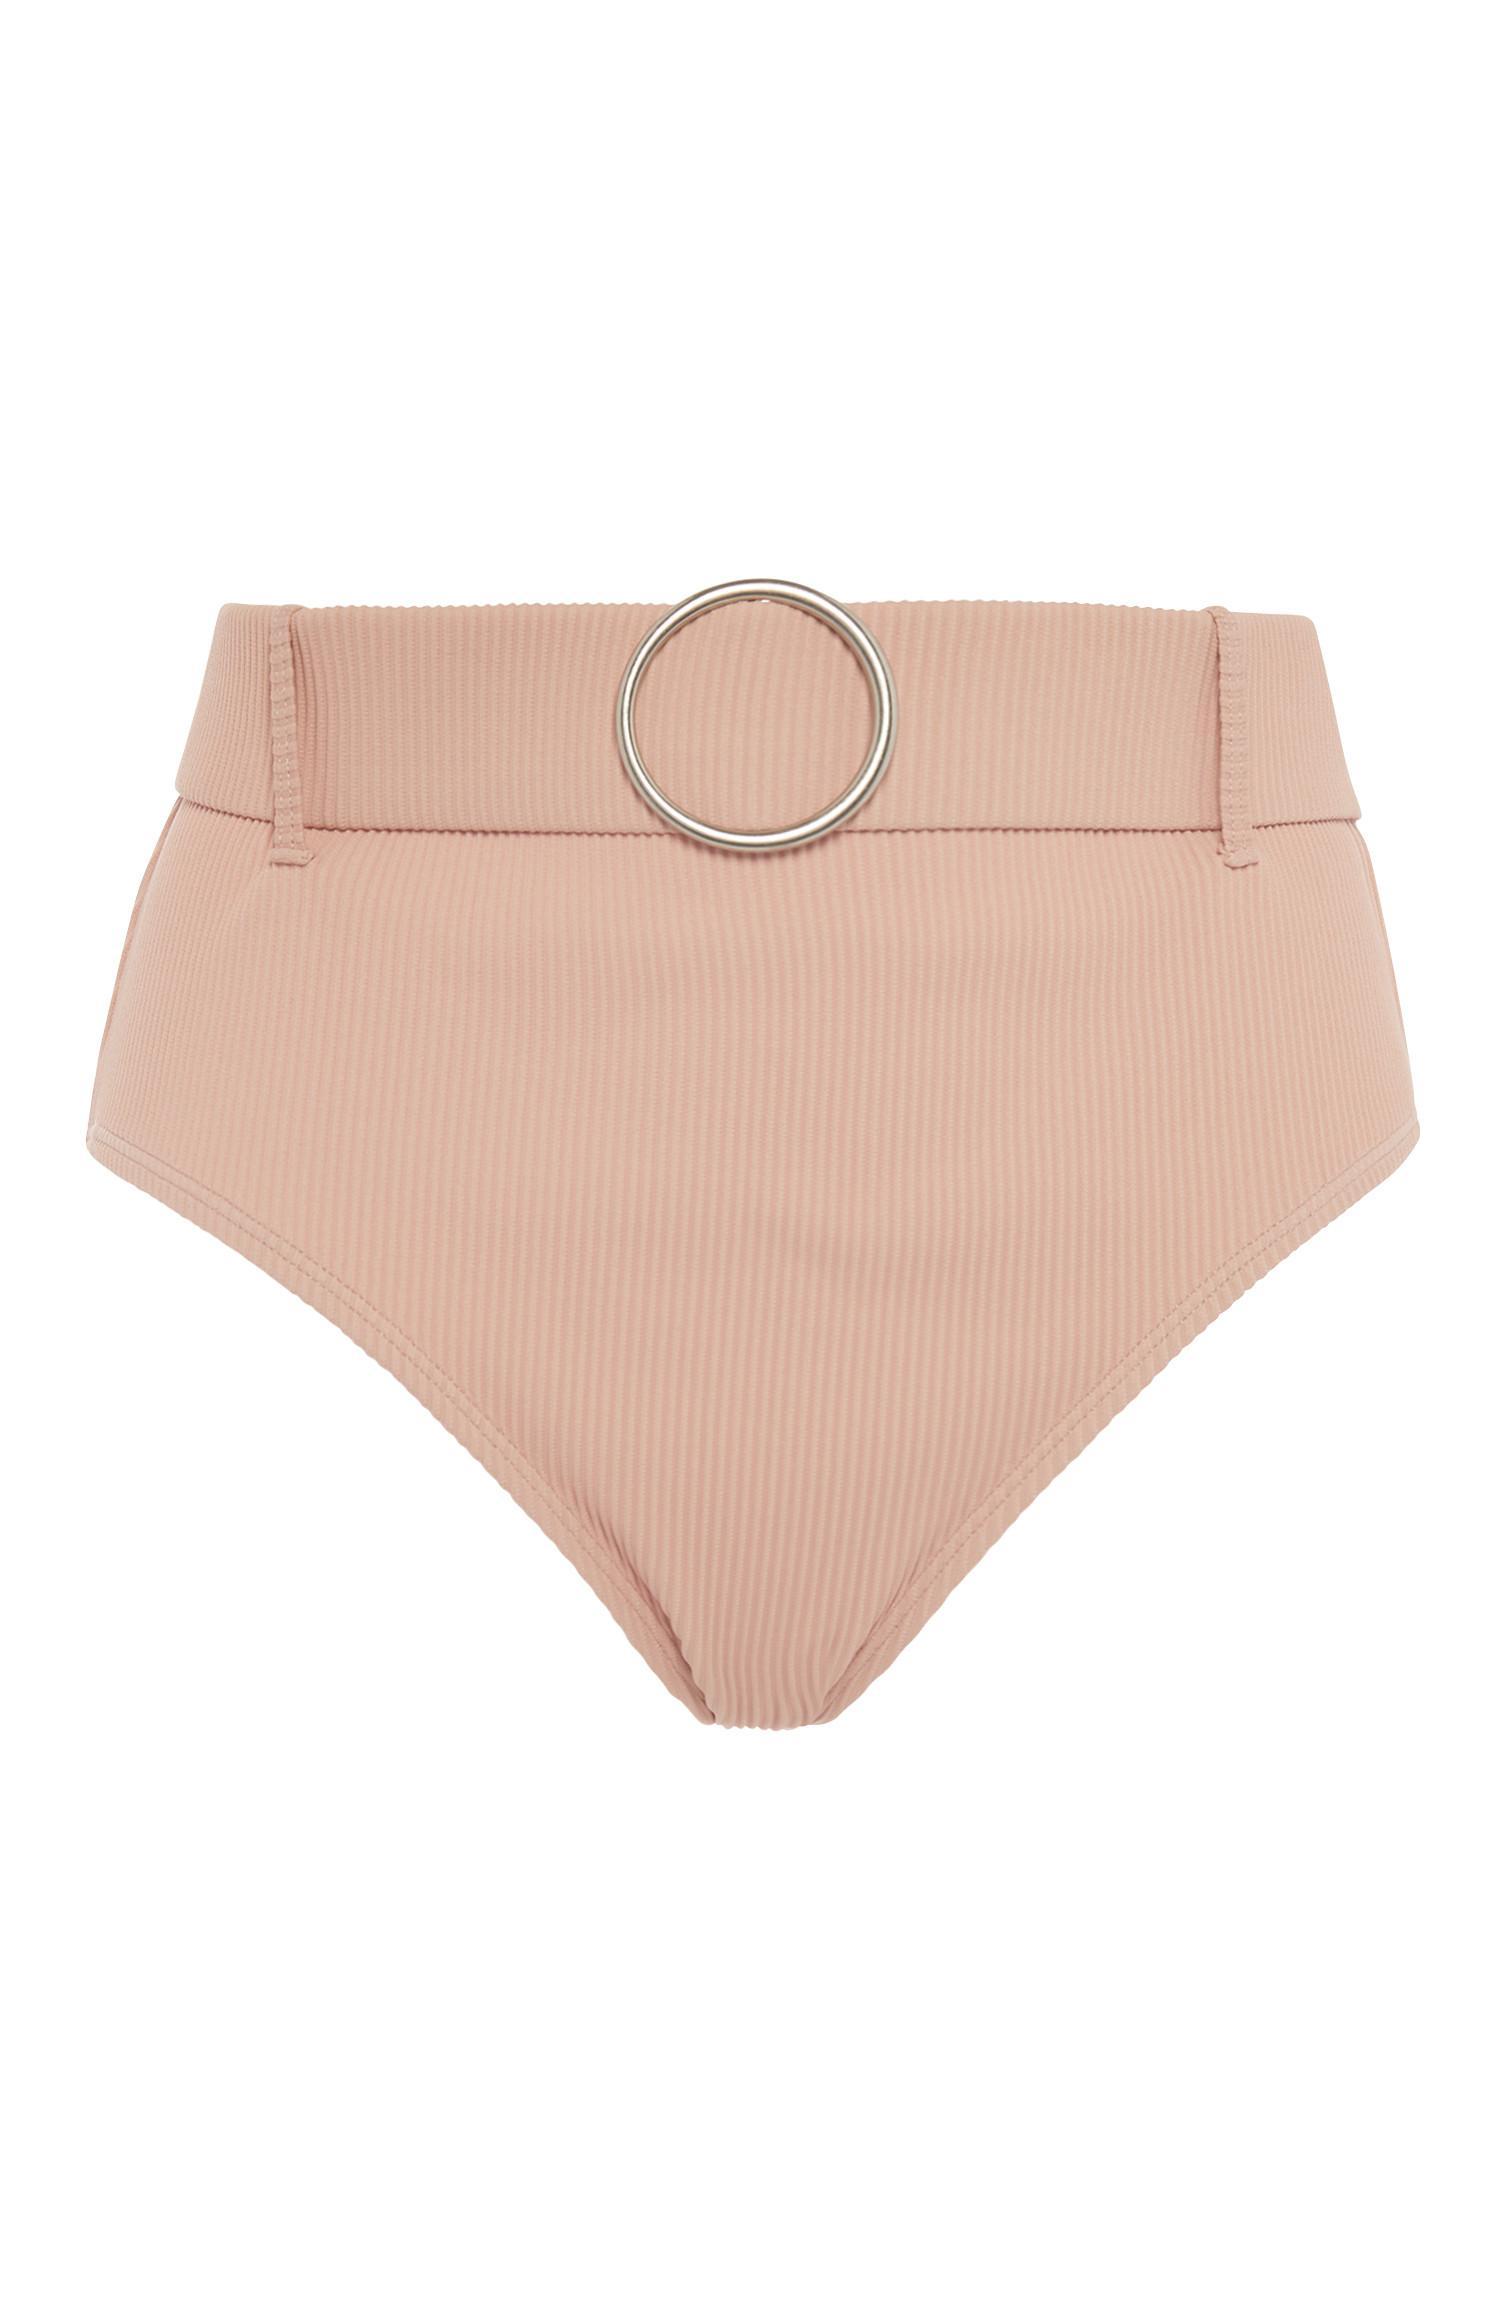 Nude Belted High Waisted Bikini Brief